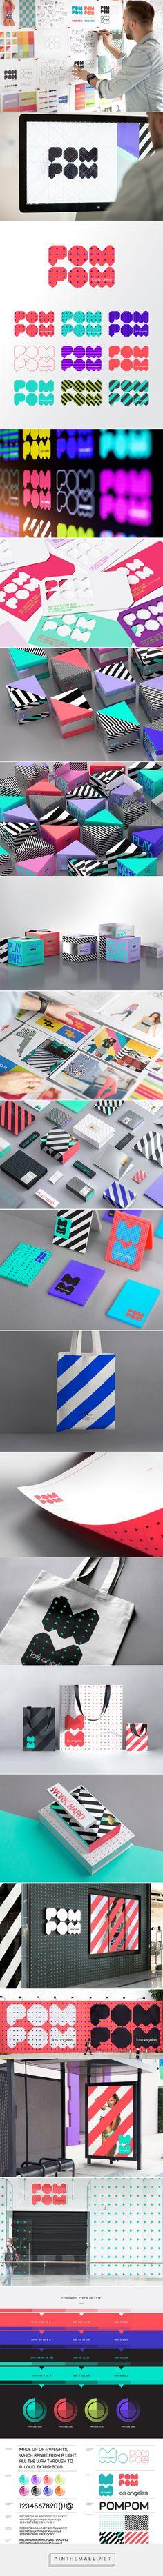 POM POM | Identity Designed - created via http://pinthemall.net